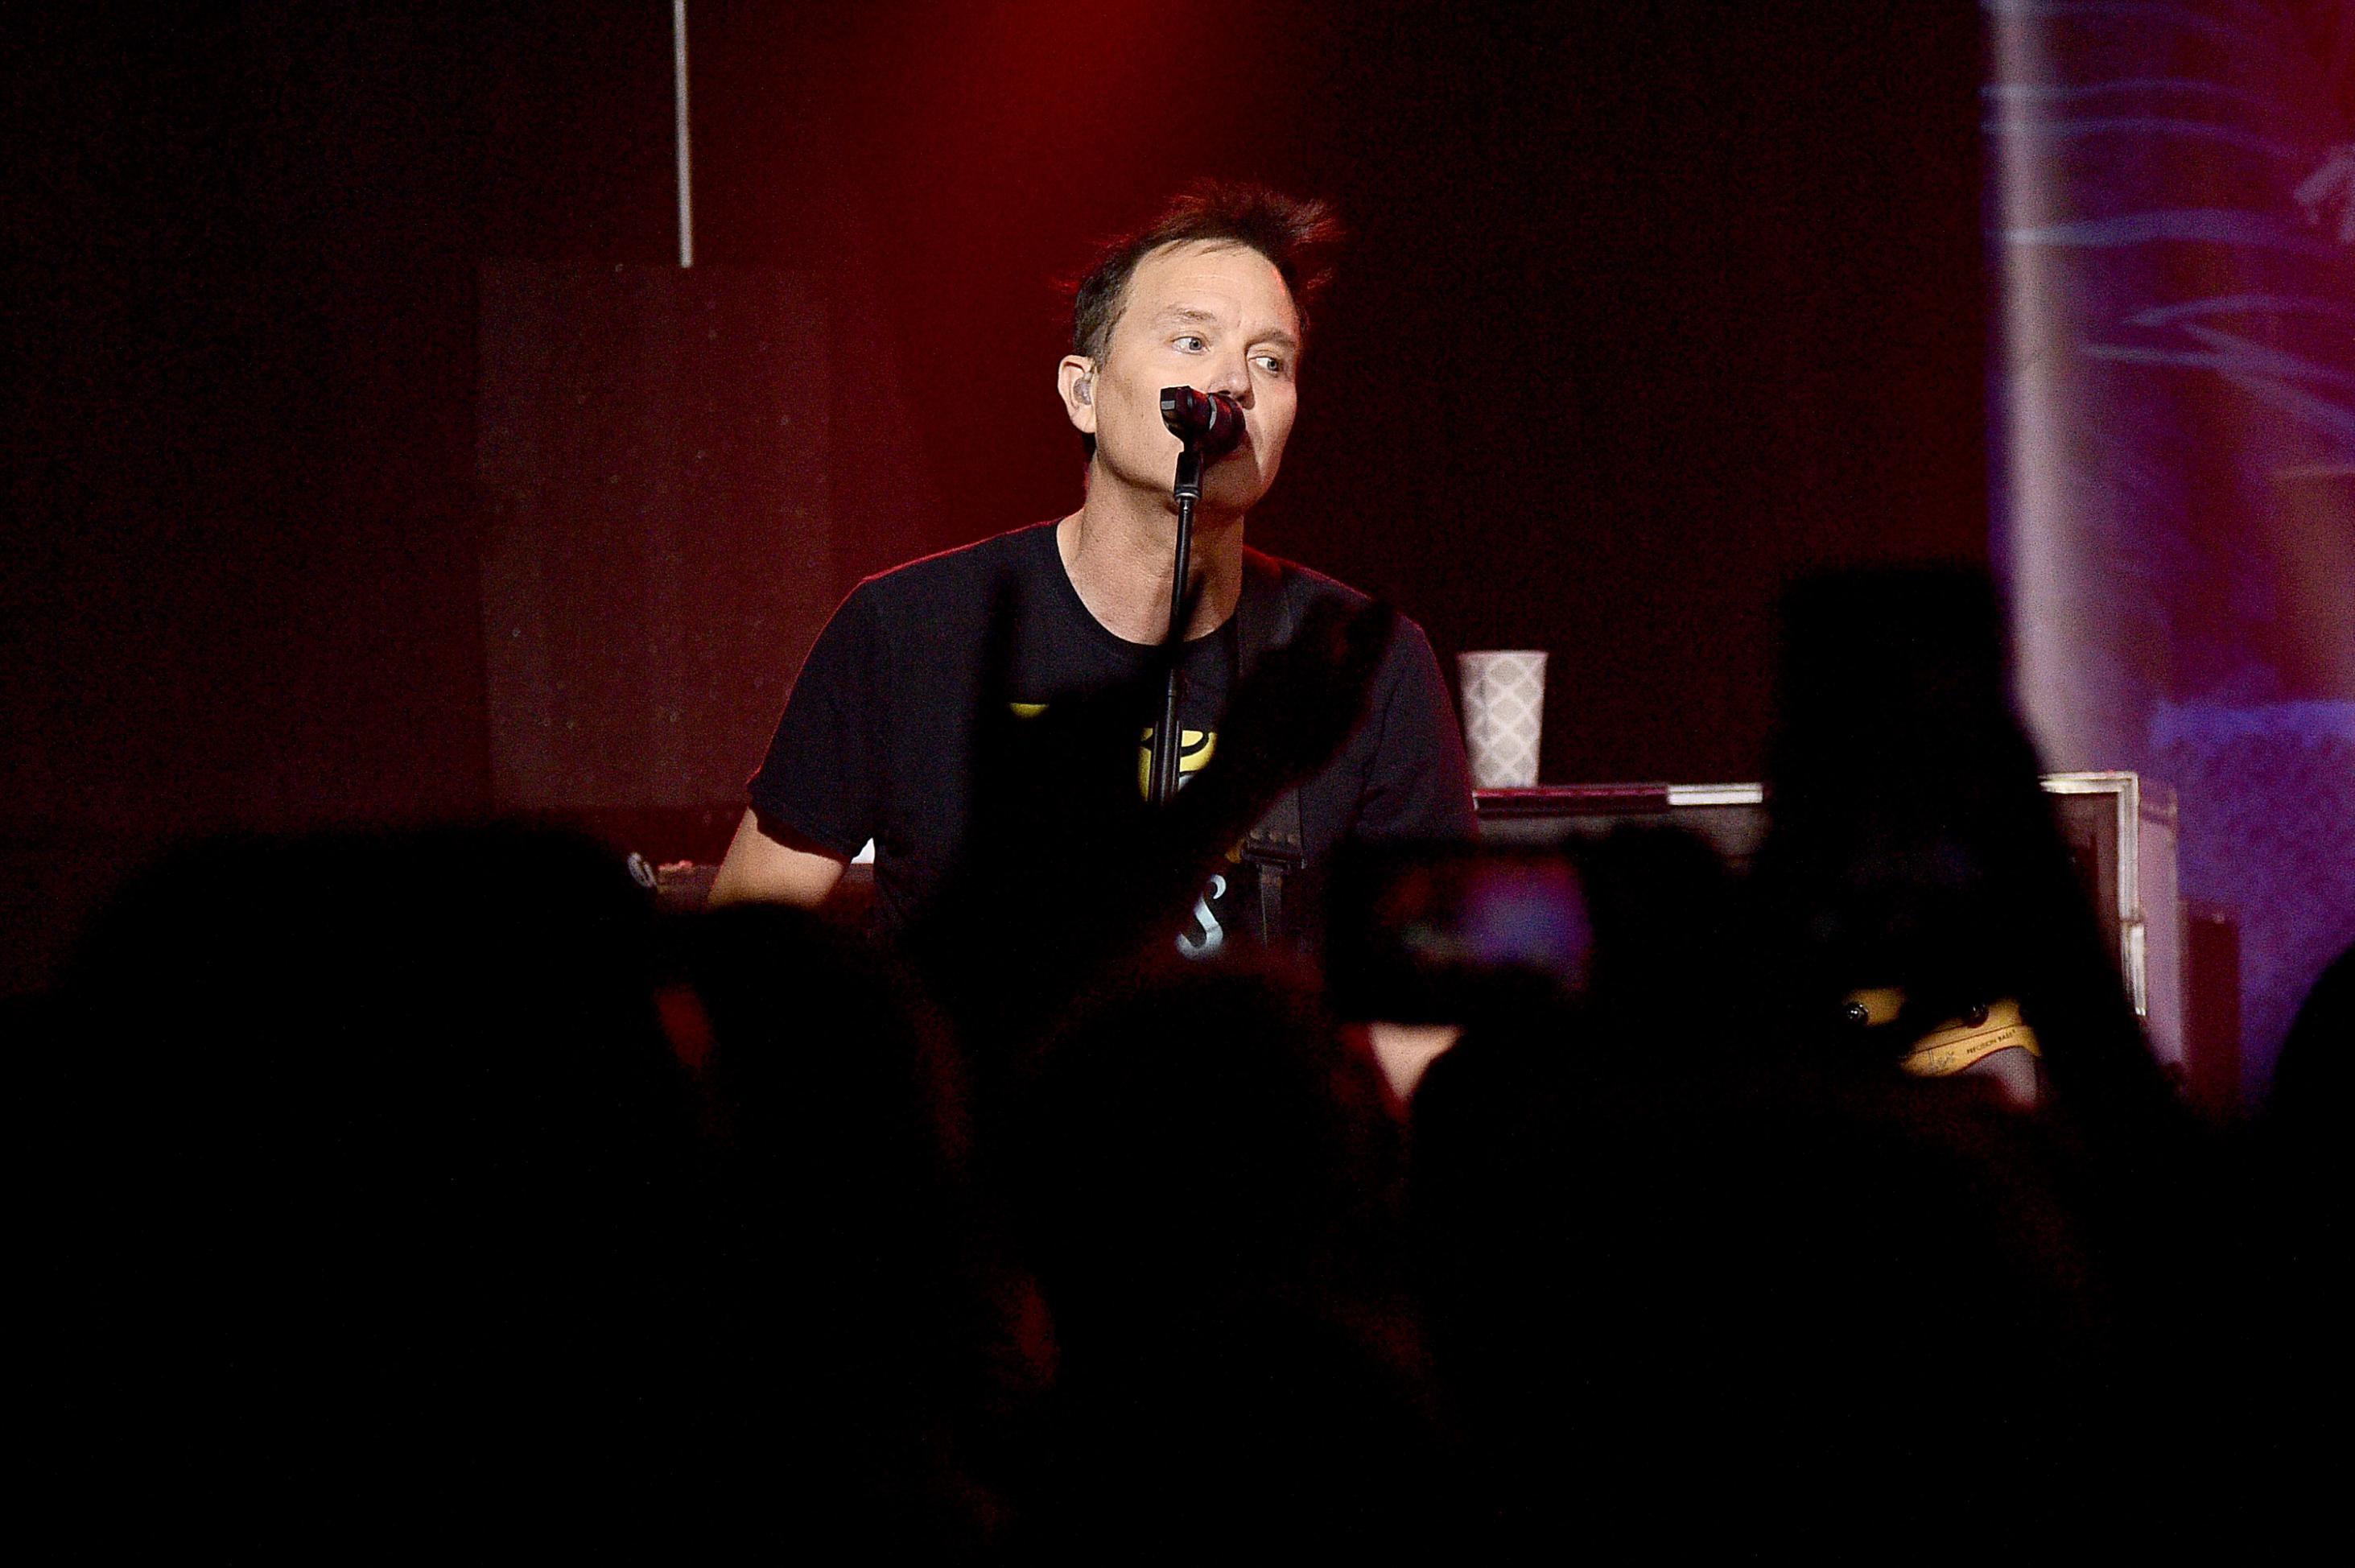 Mark Hoppus of Blink-182 offers cancer treatment update